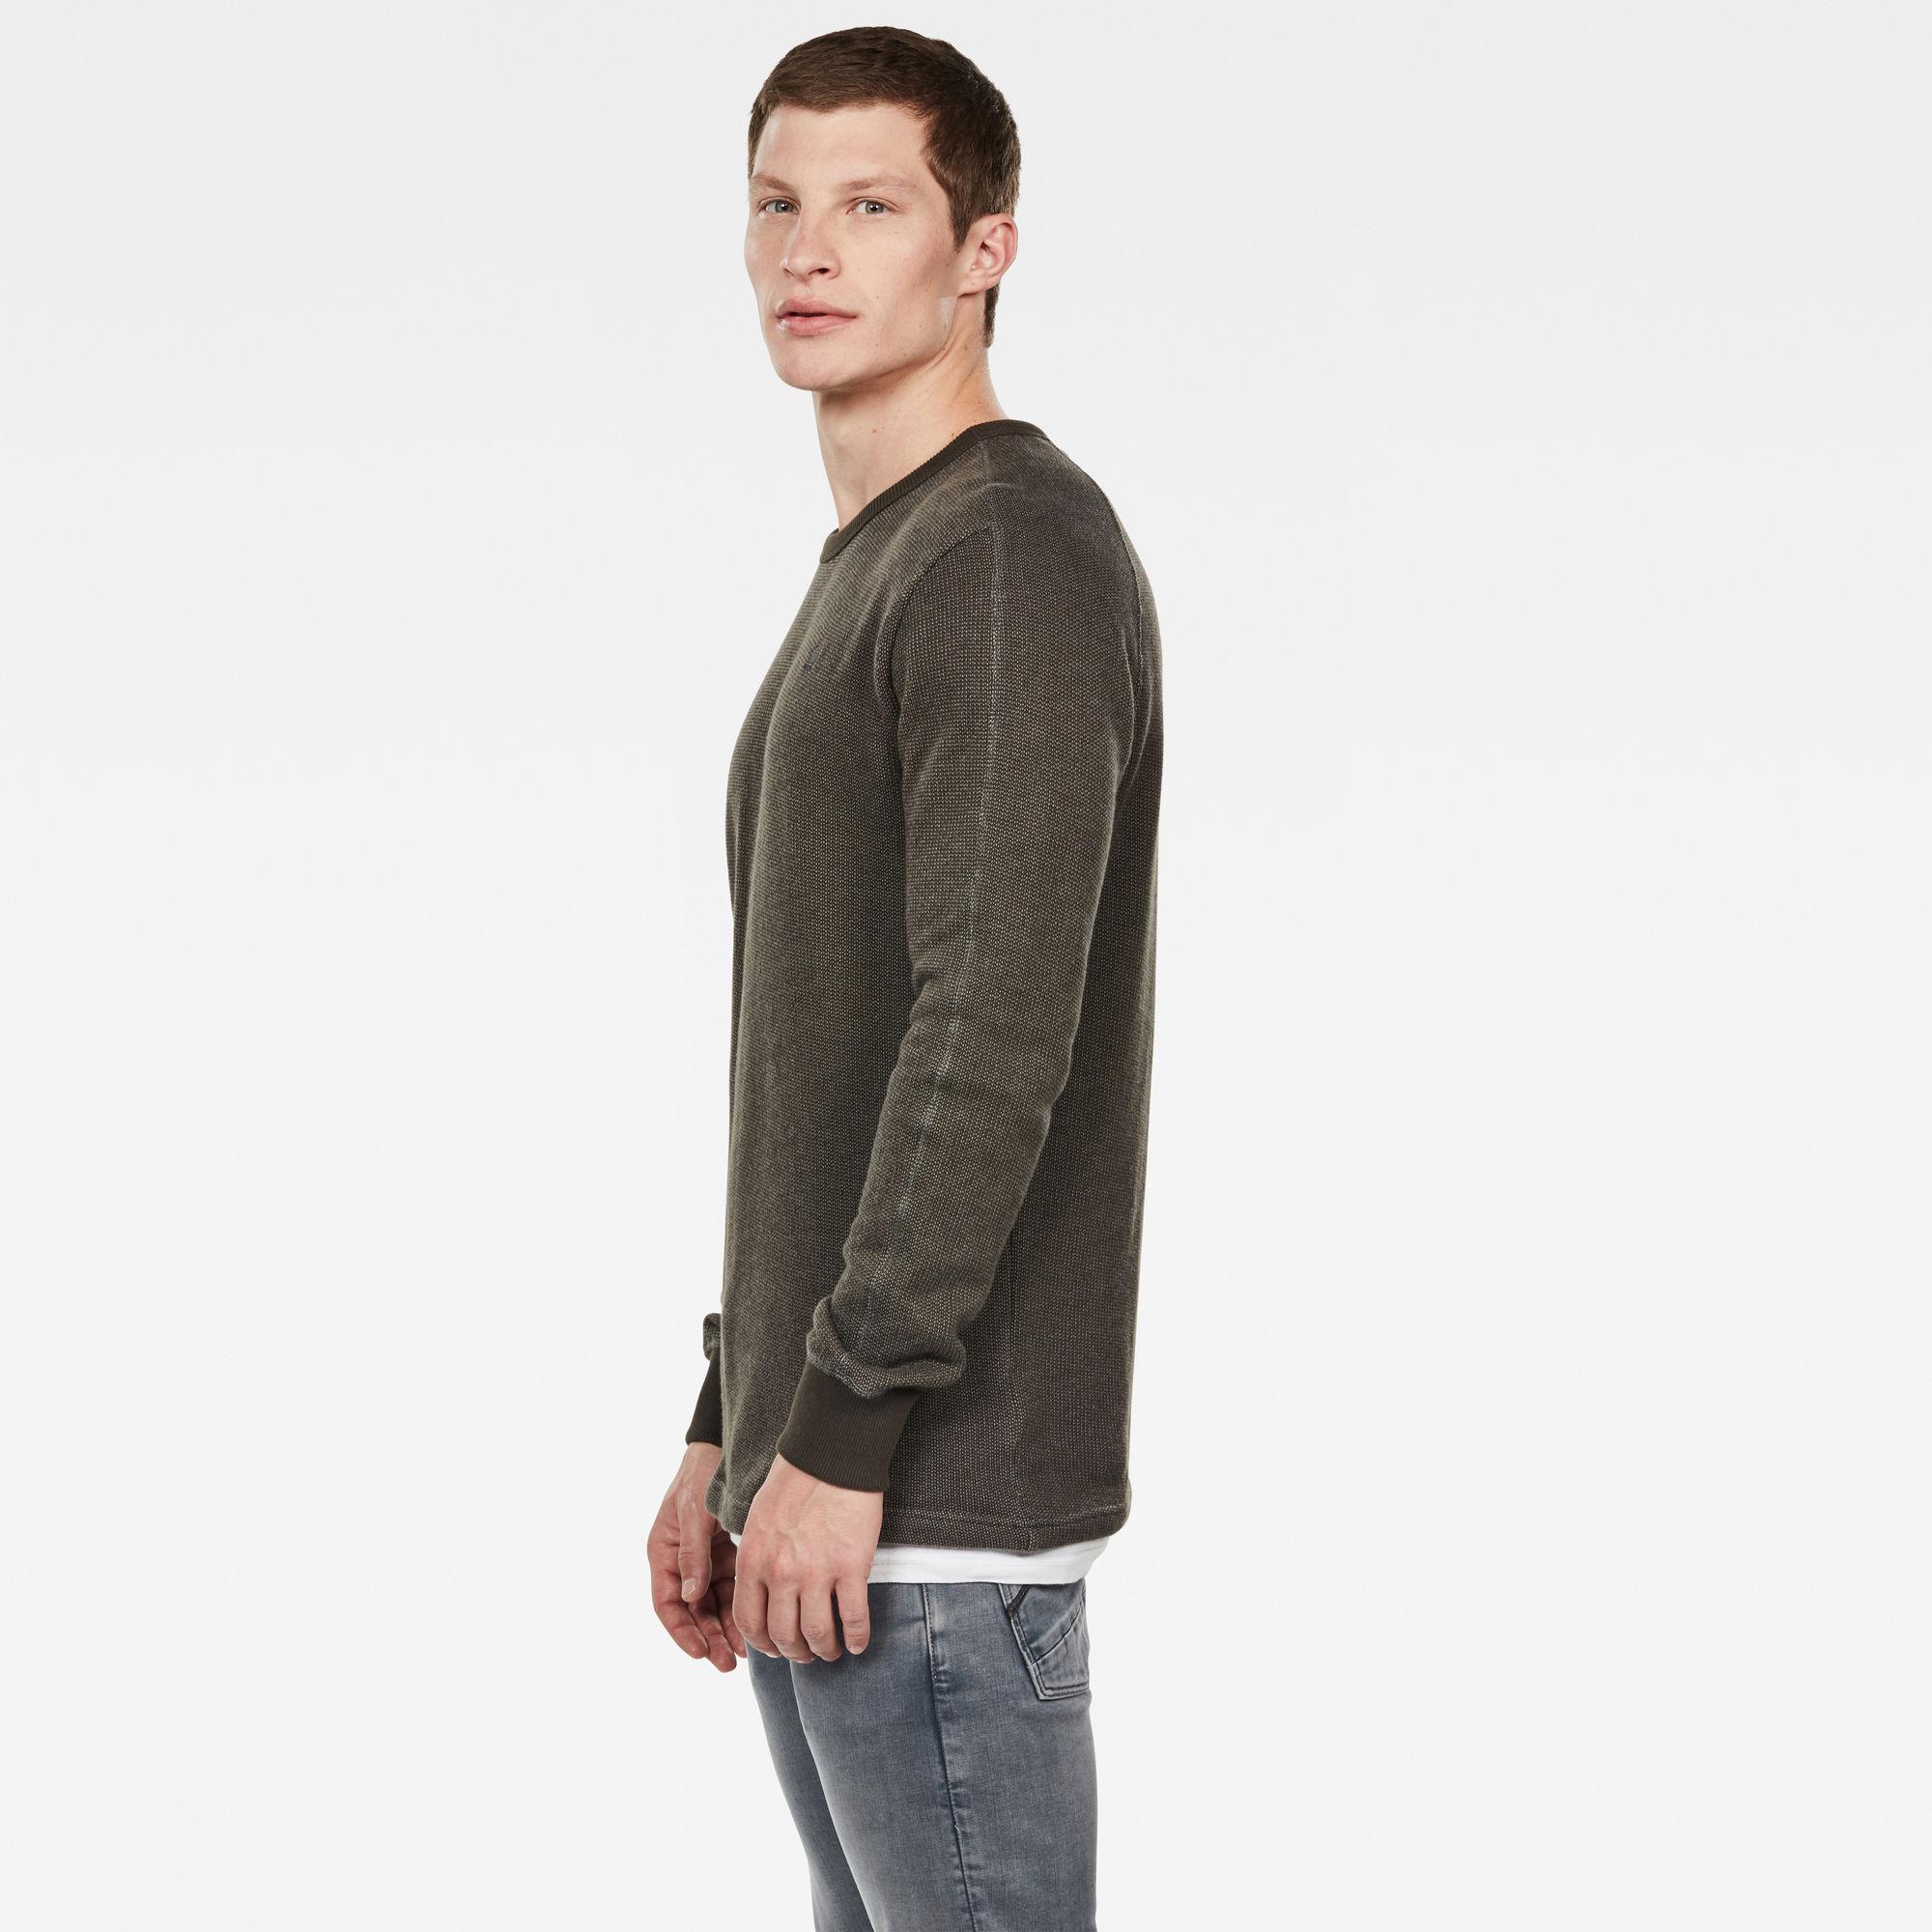 Korpaz Sweater